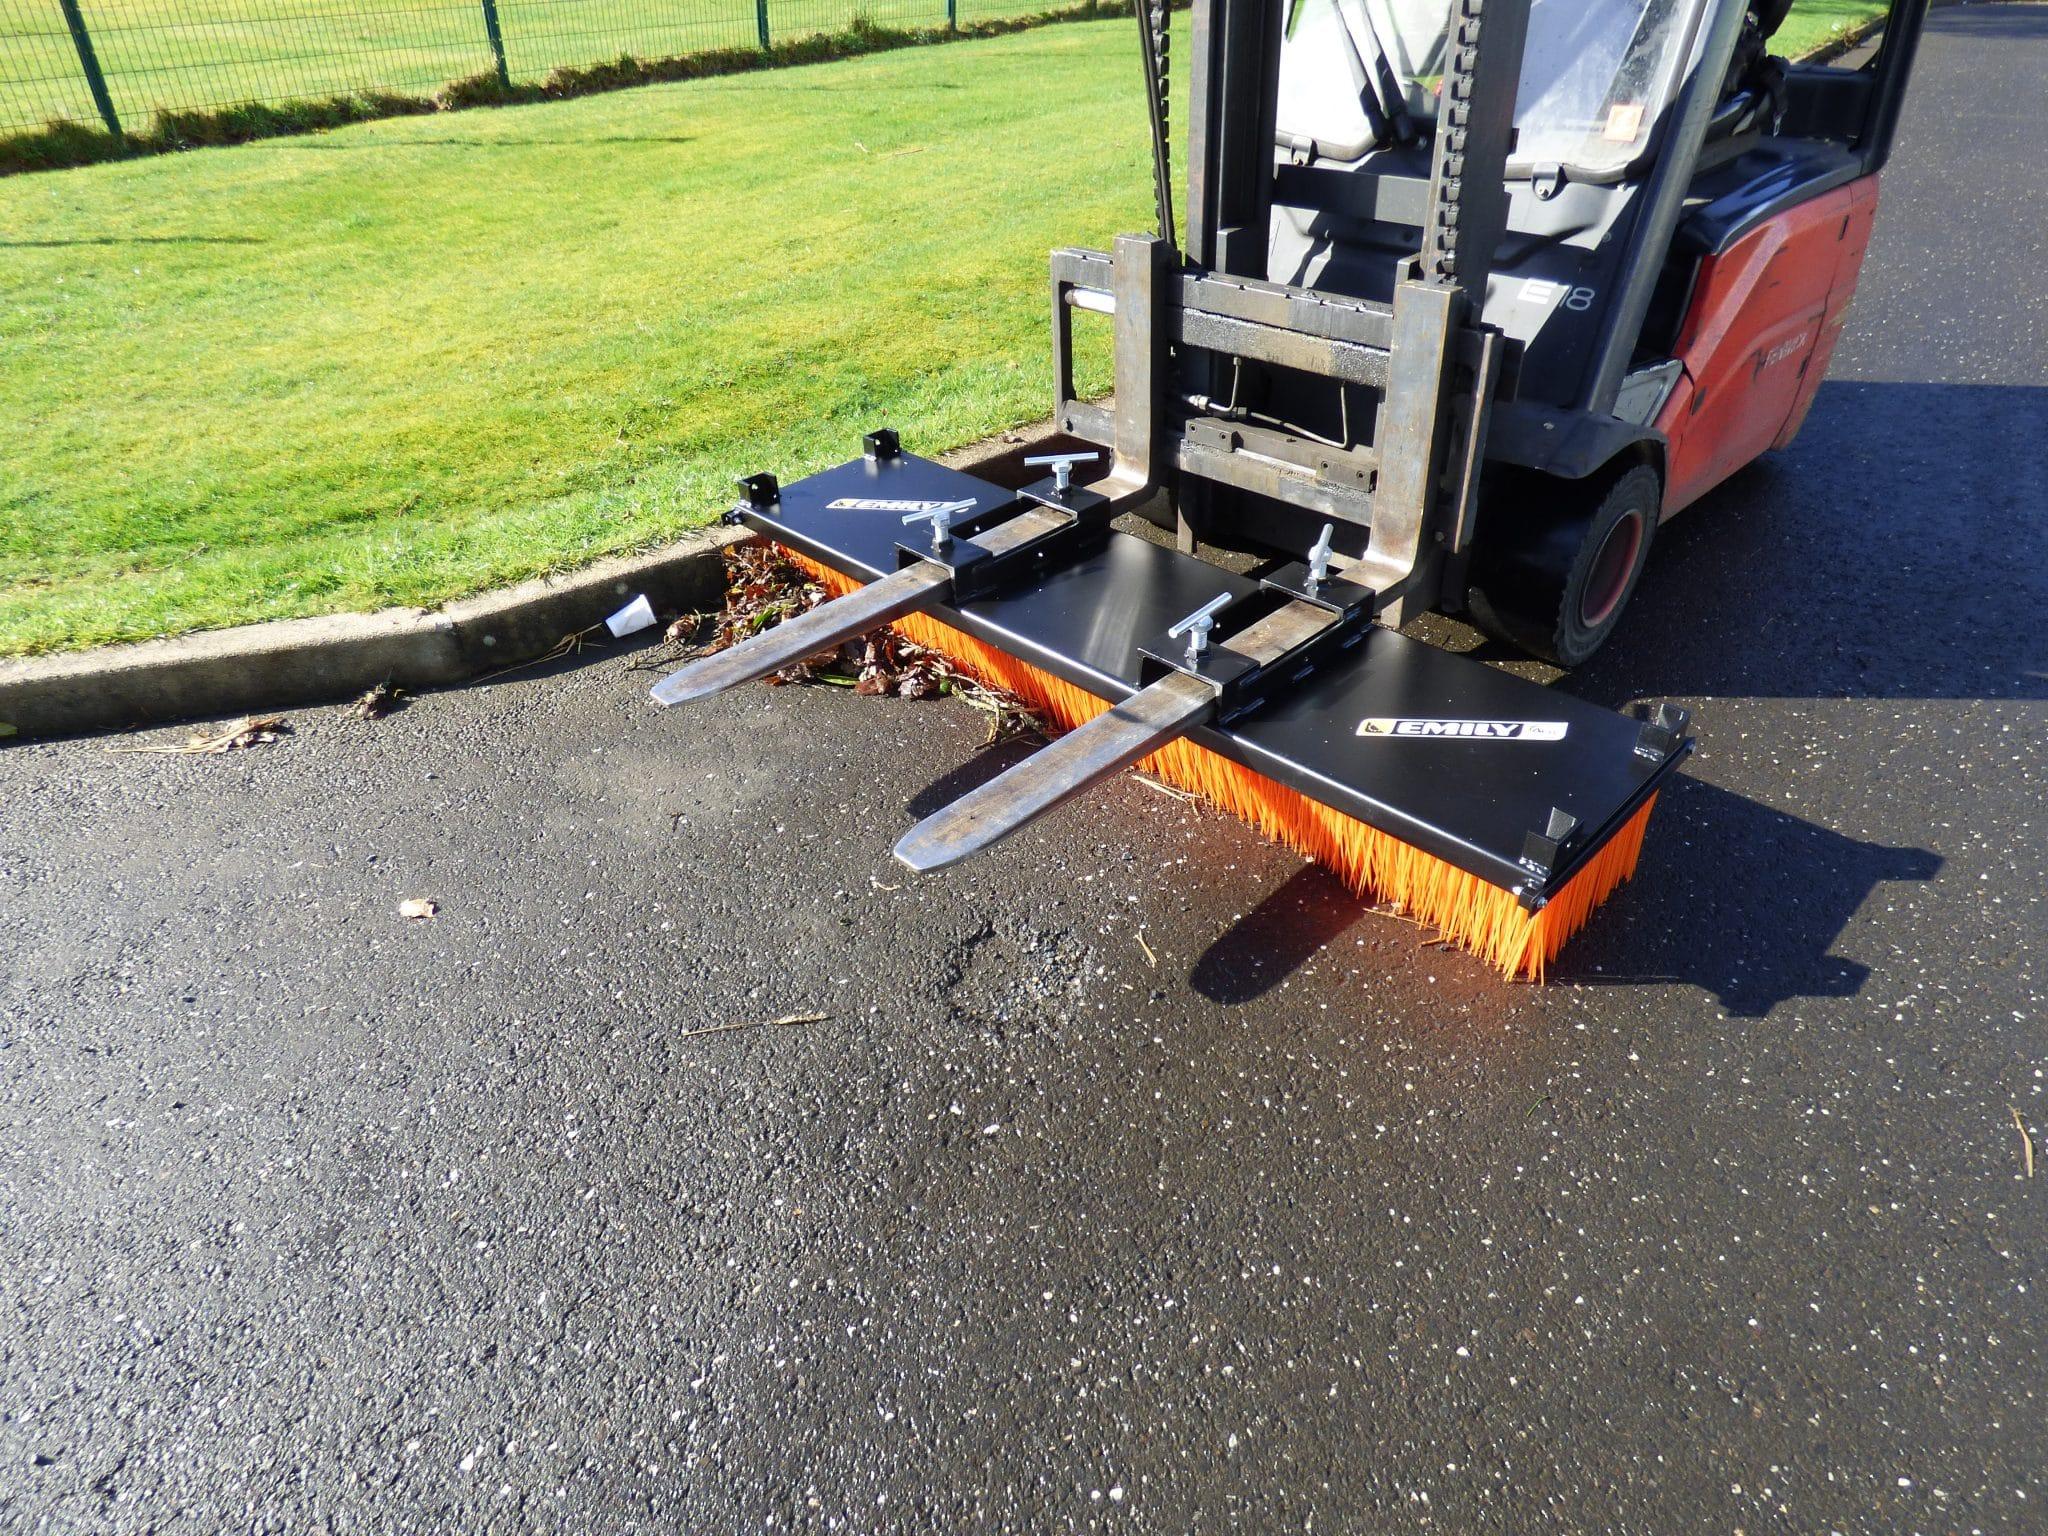 Modulo'sweep